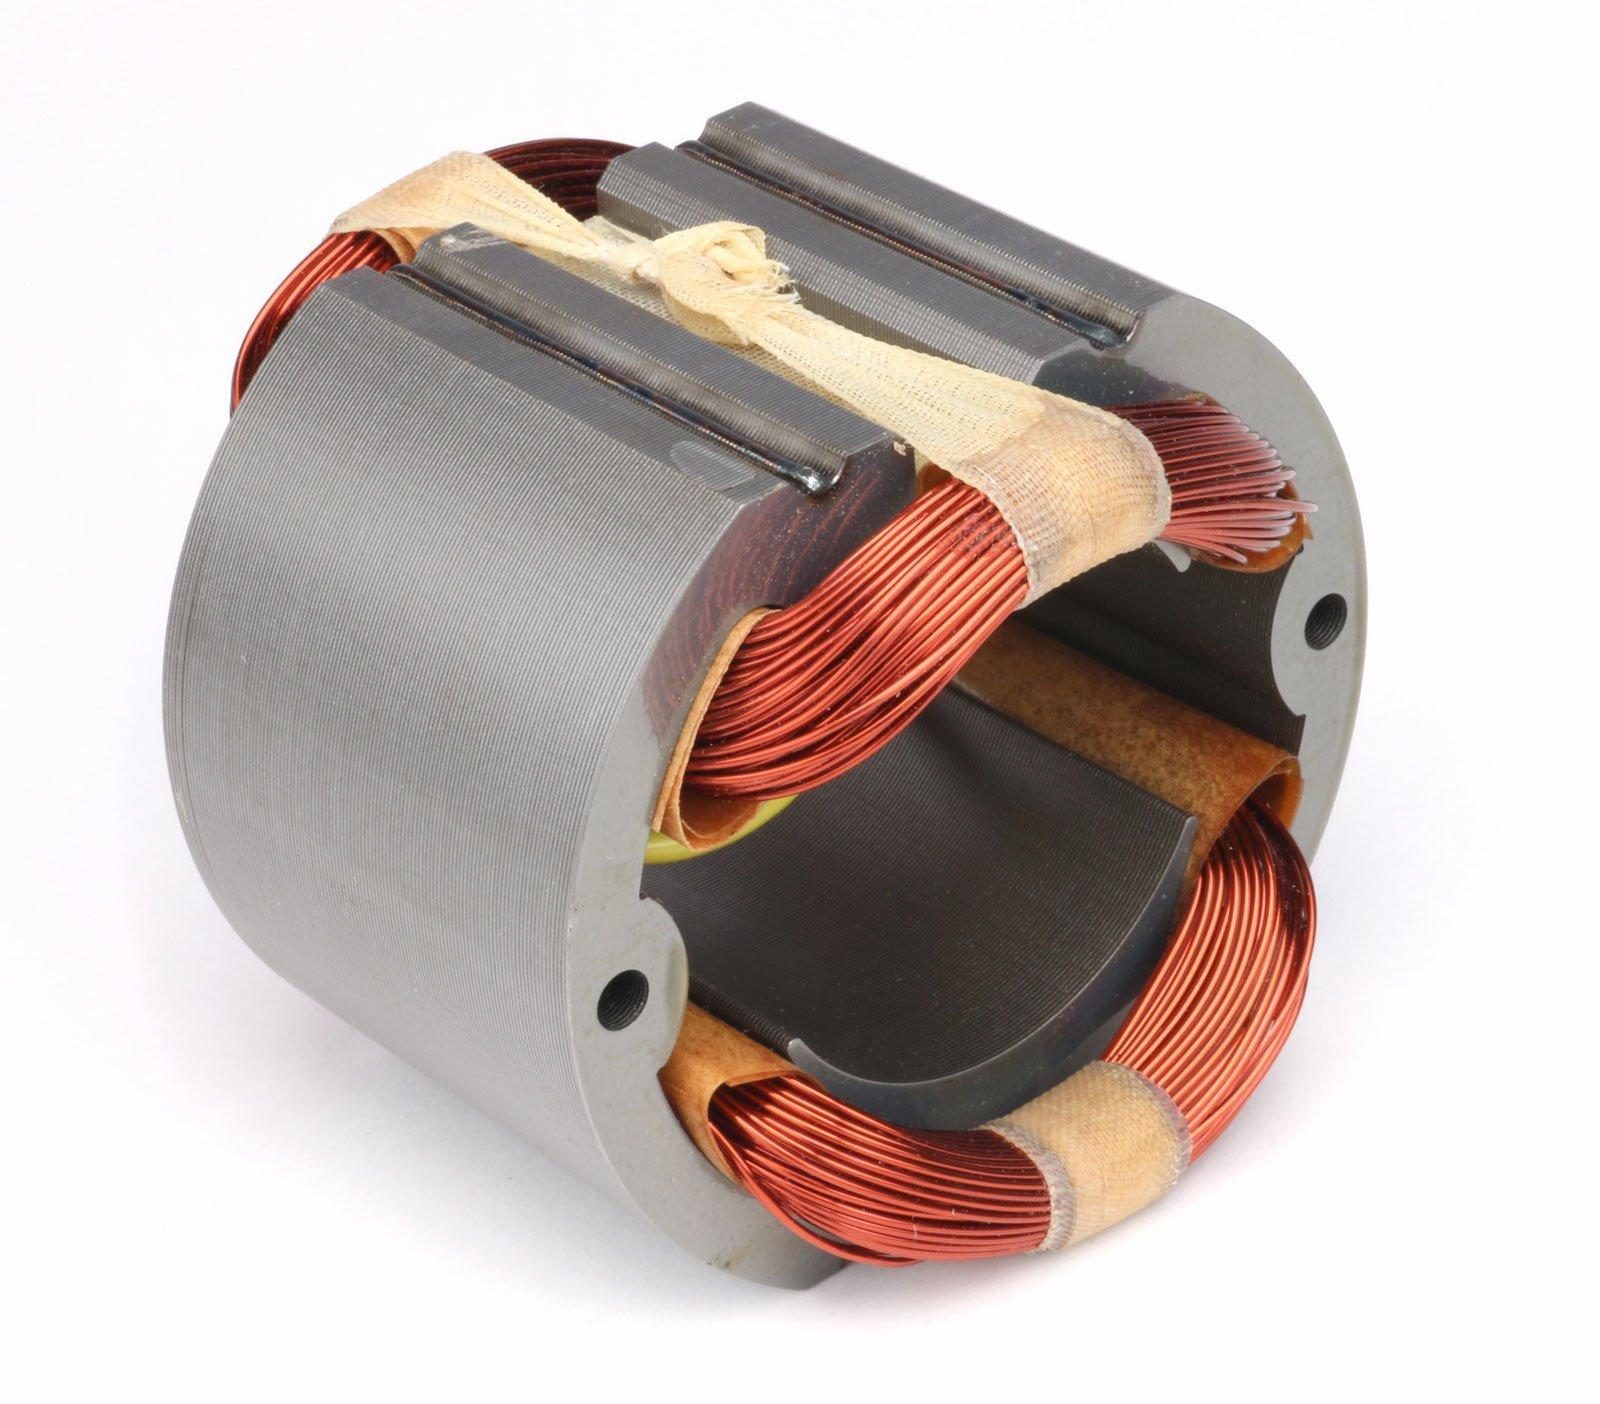 Steel Dragon Tools 44070 Motor Field fits RIDGID 700 Power Drive Pipe Threader Threading Machine